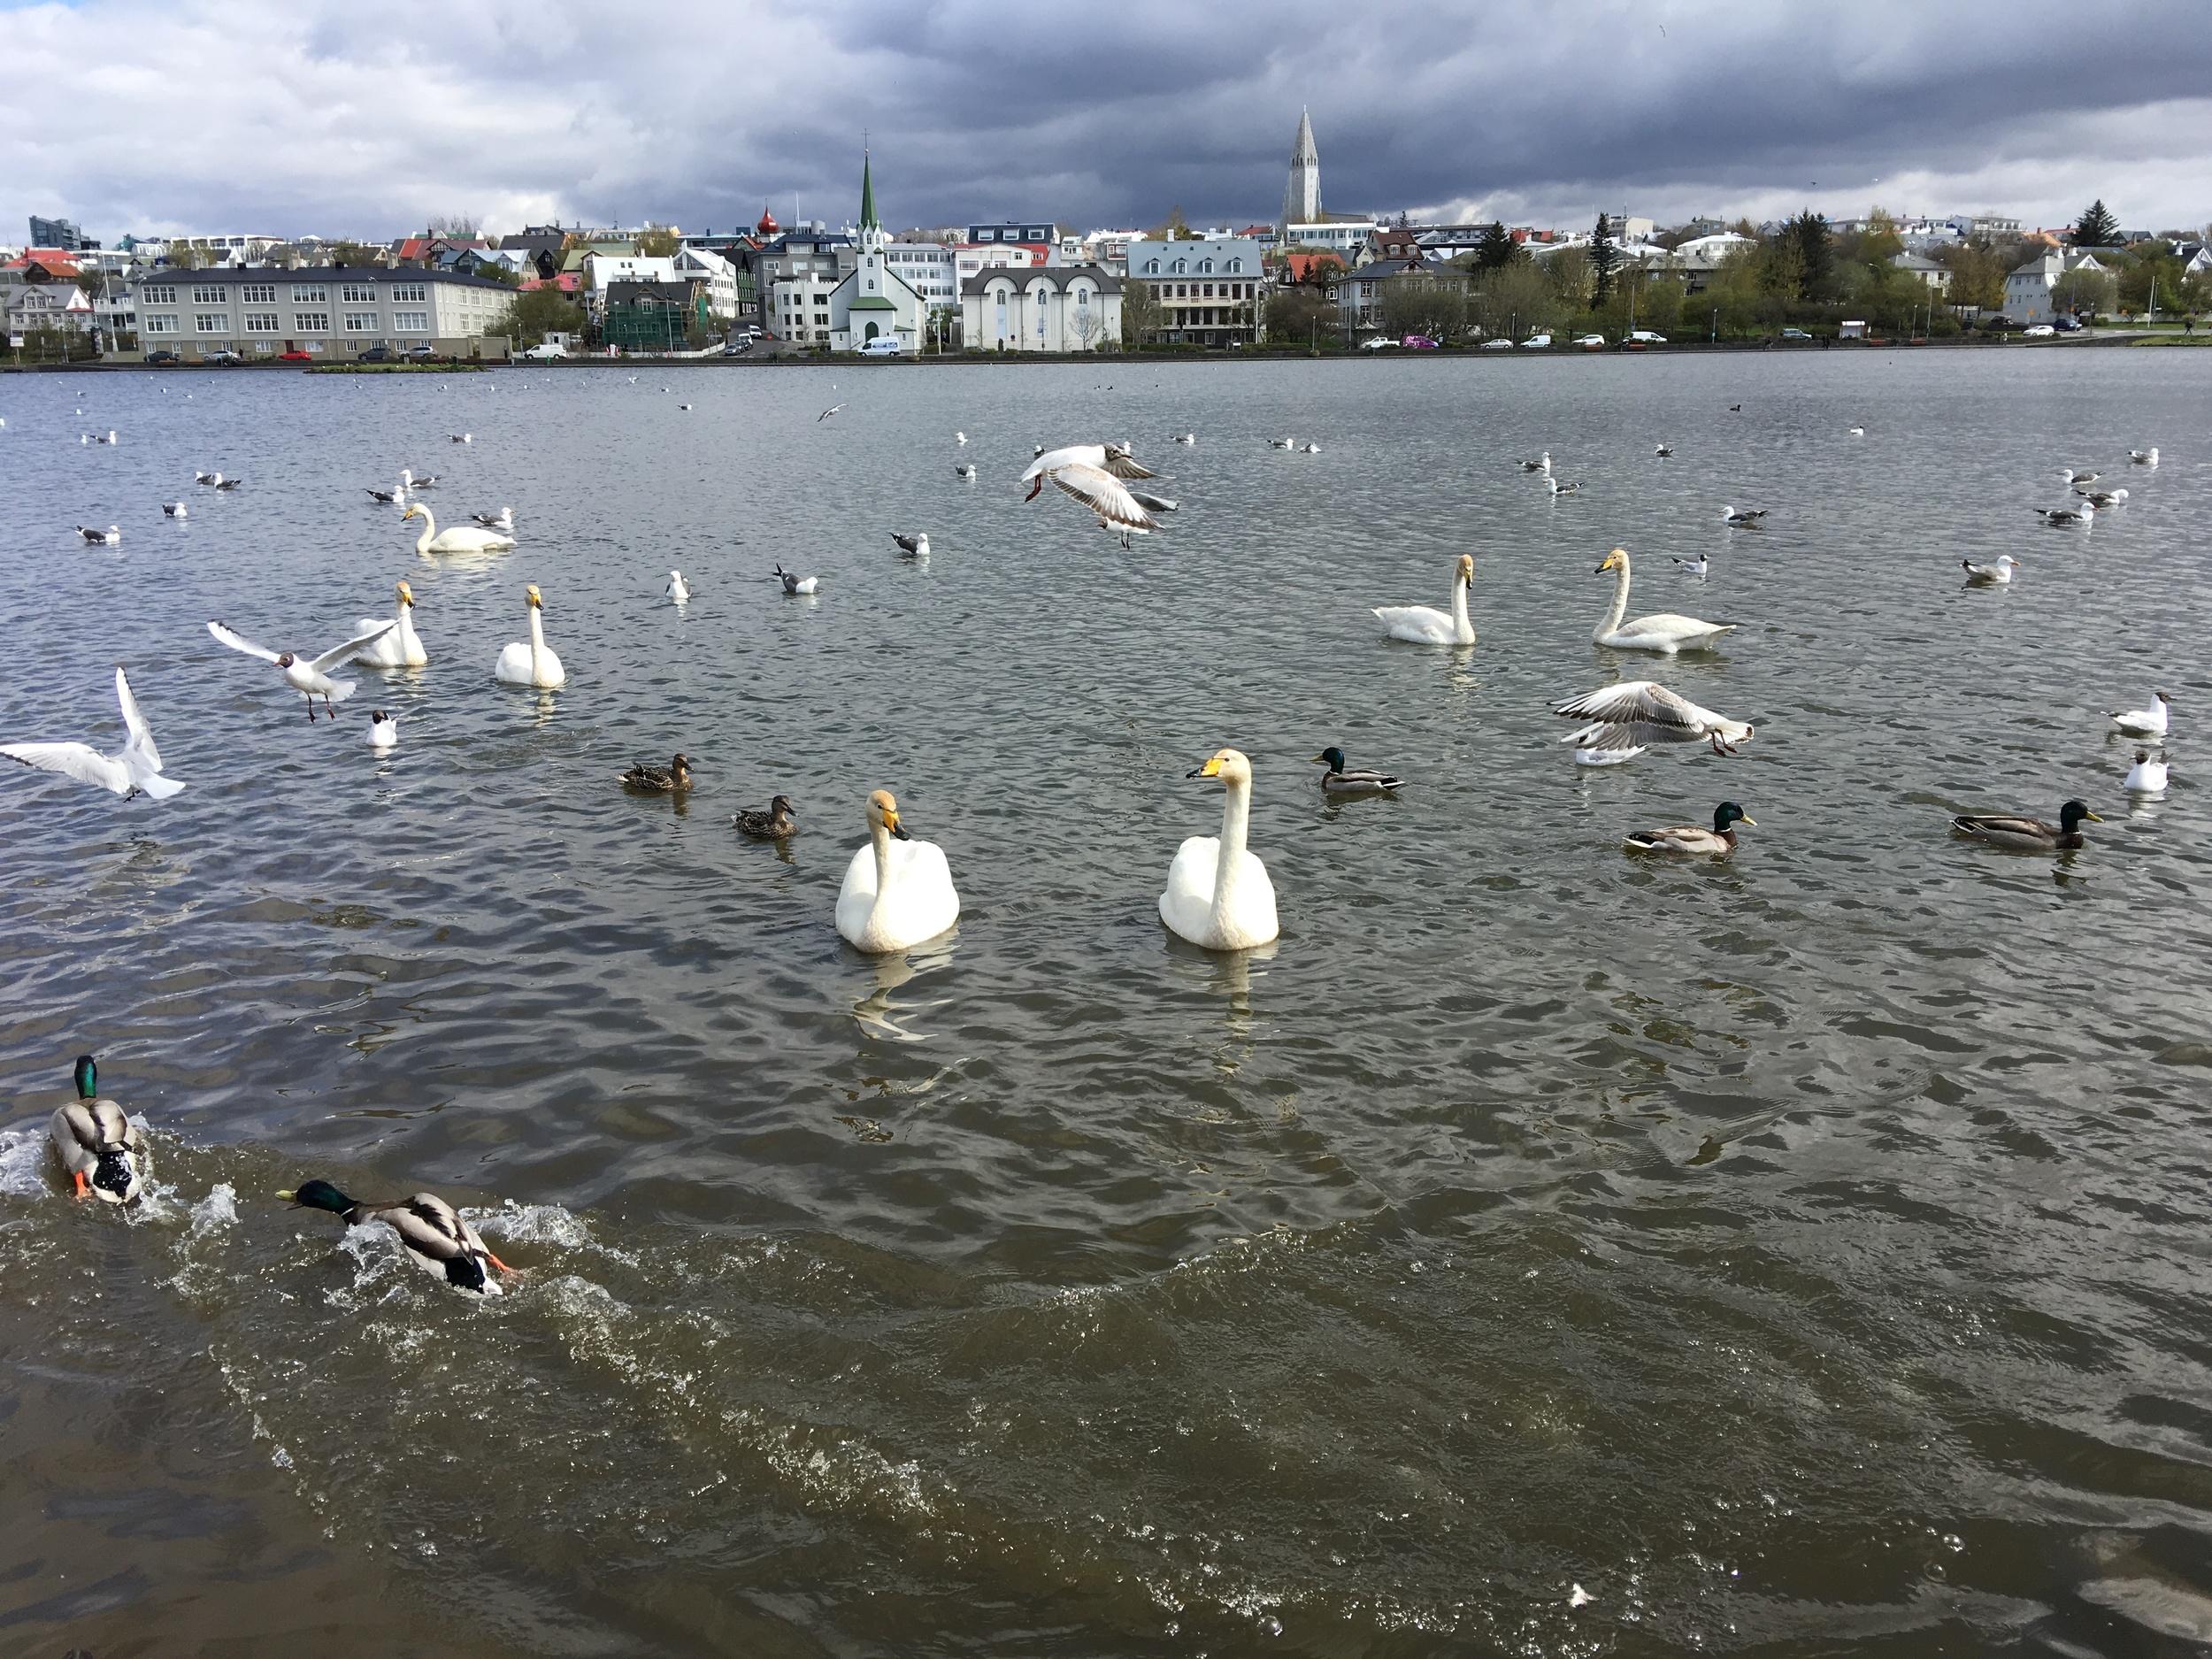 Feisty water birds